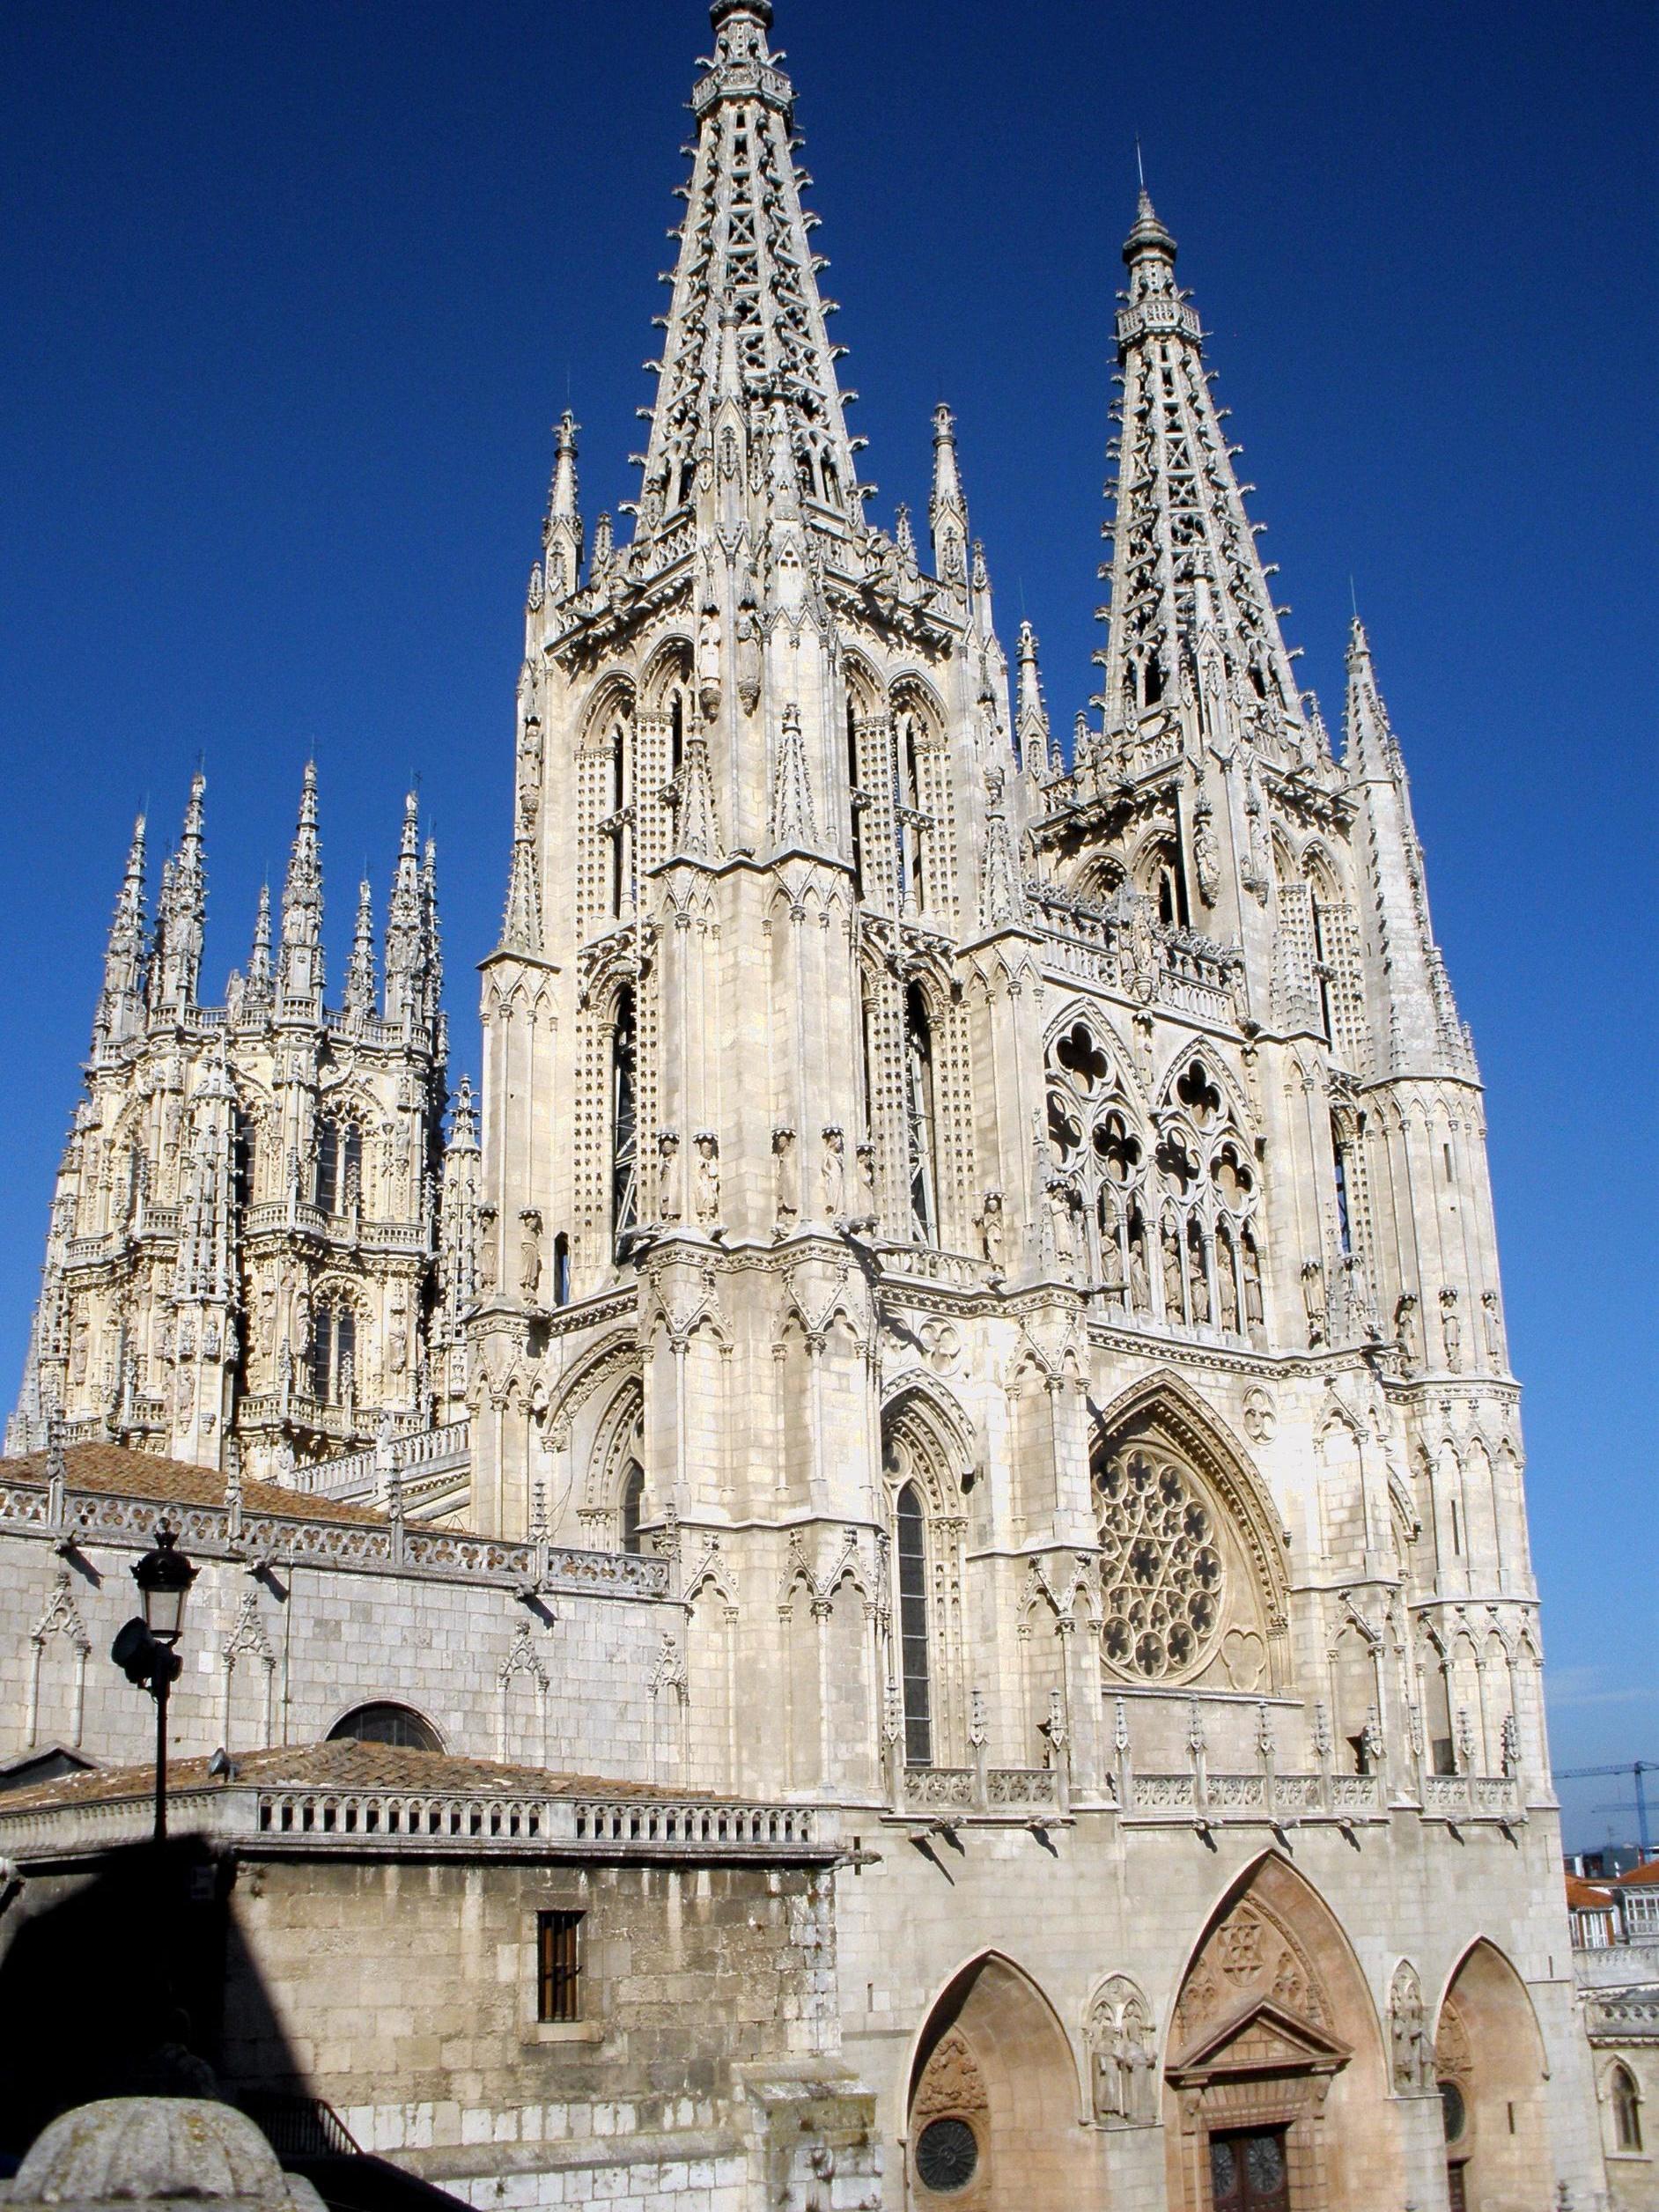 File:Burgos - Catedral 163.jpg - Wikimedia Commons